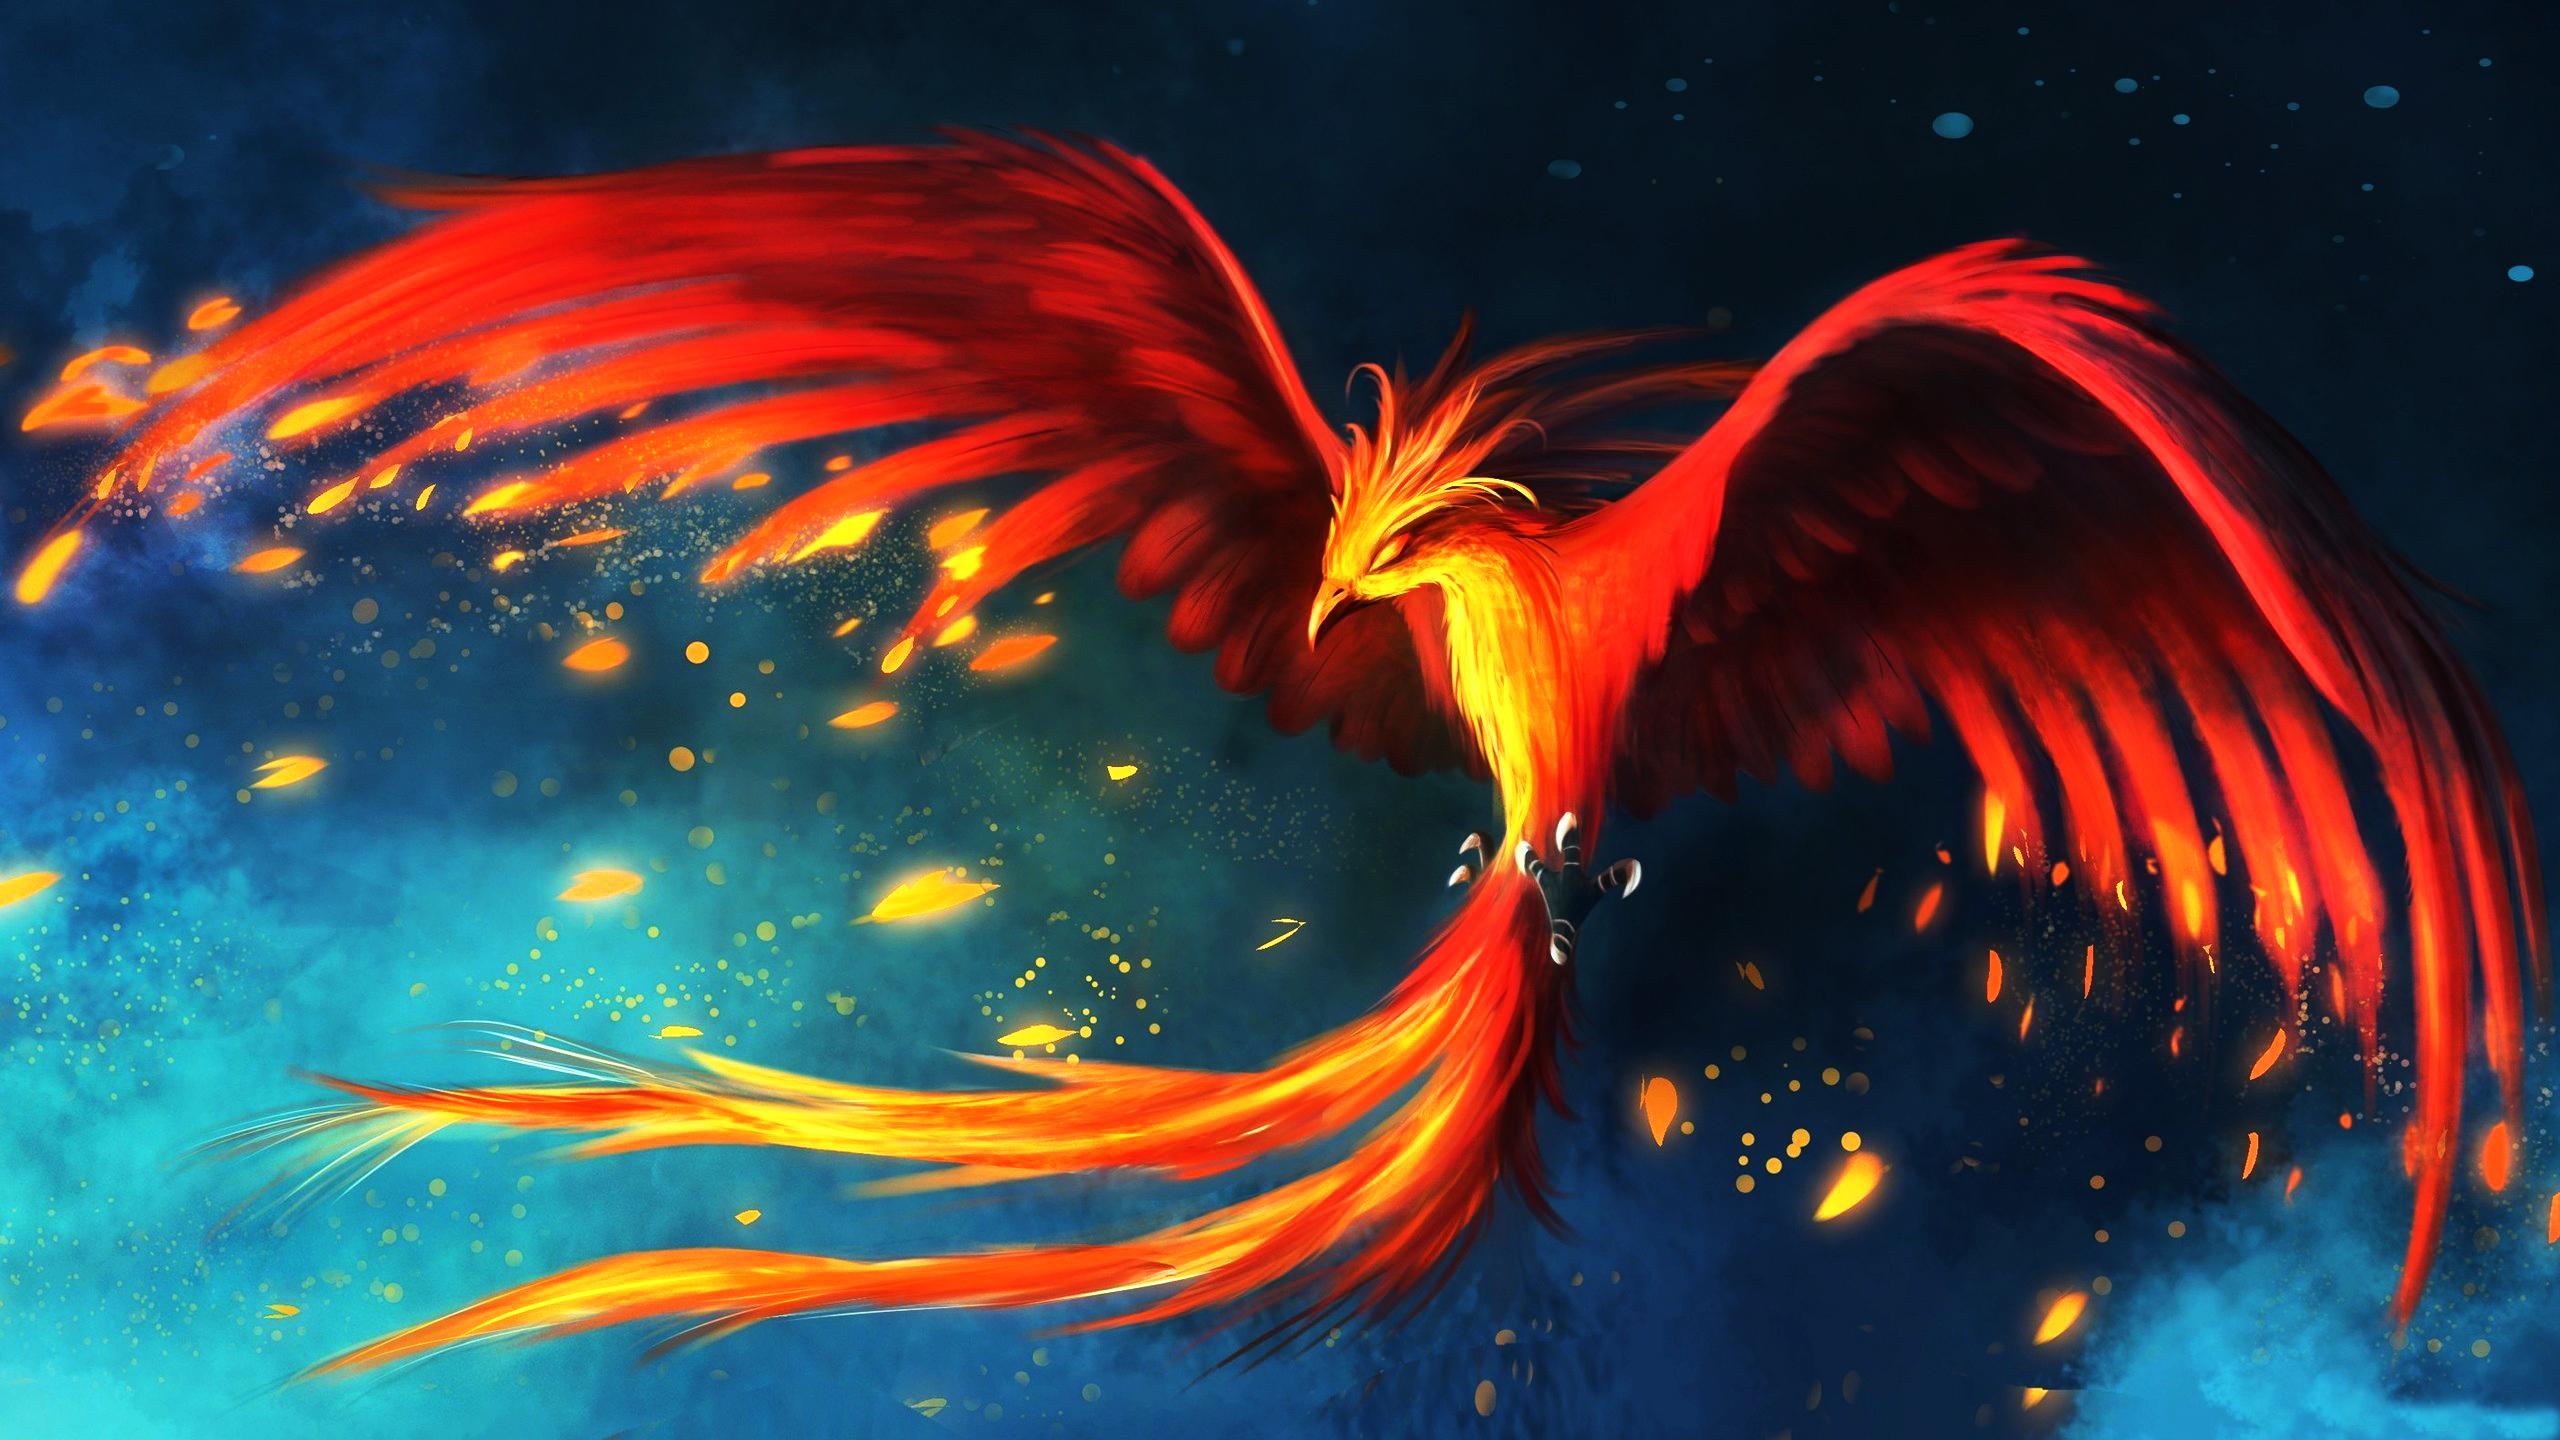 Phoenix the cyclically regenerated bird desihighway voltagebd Gallery